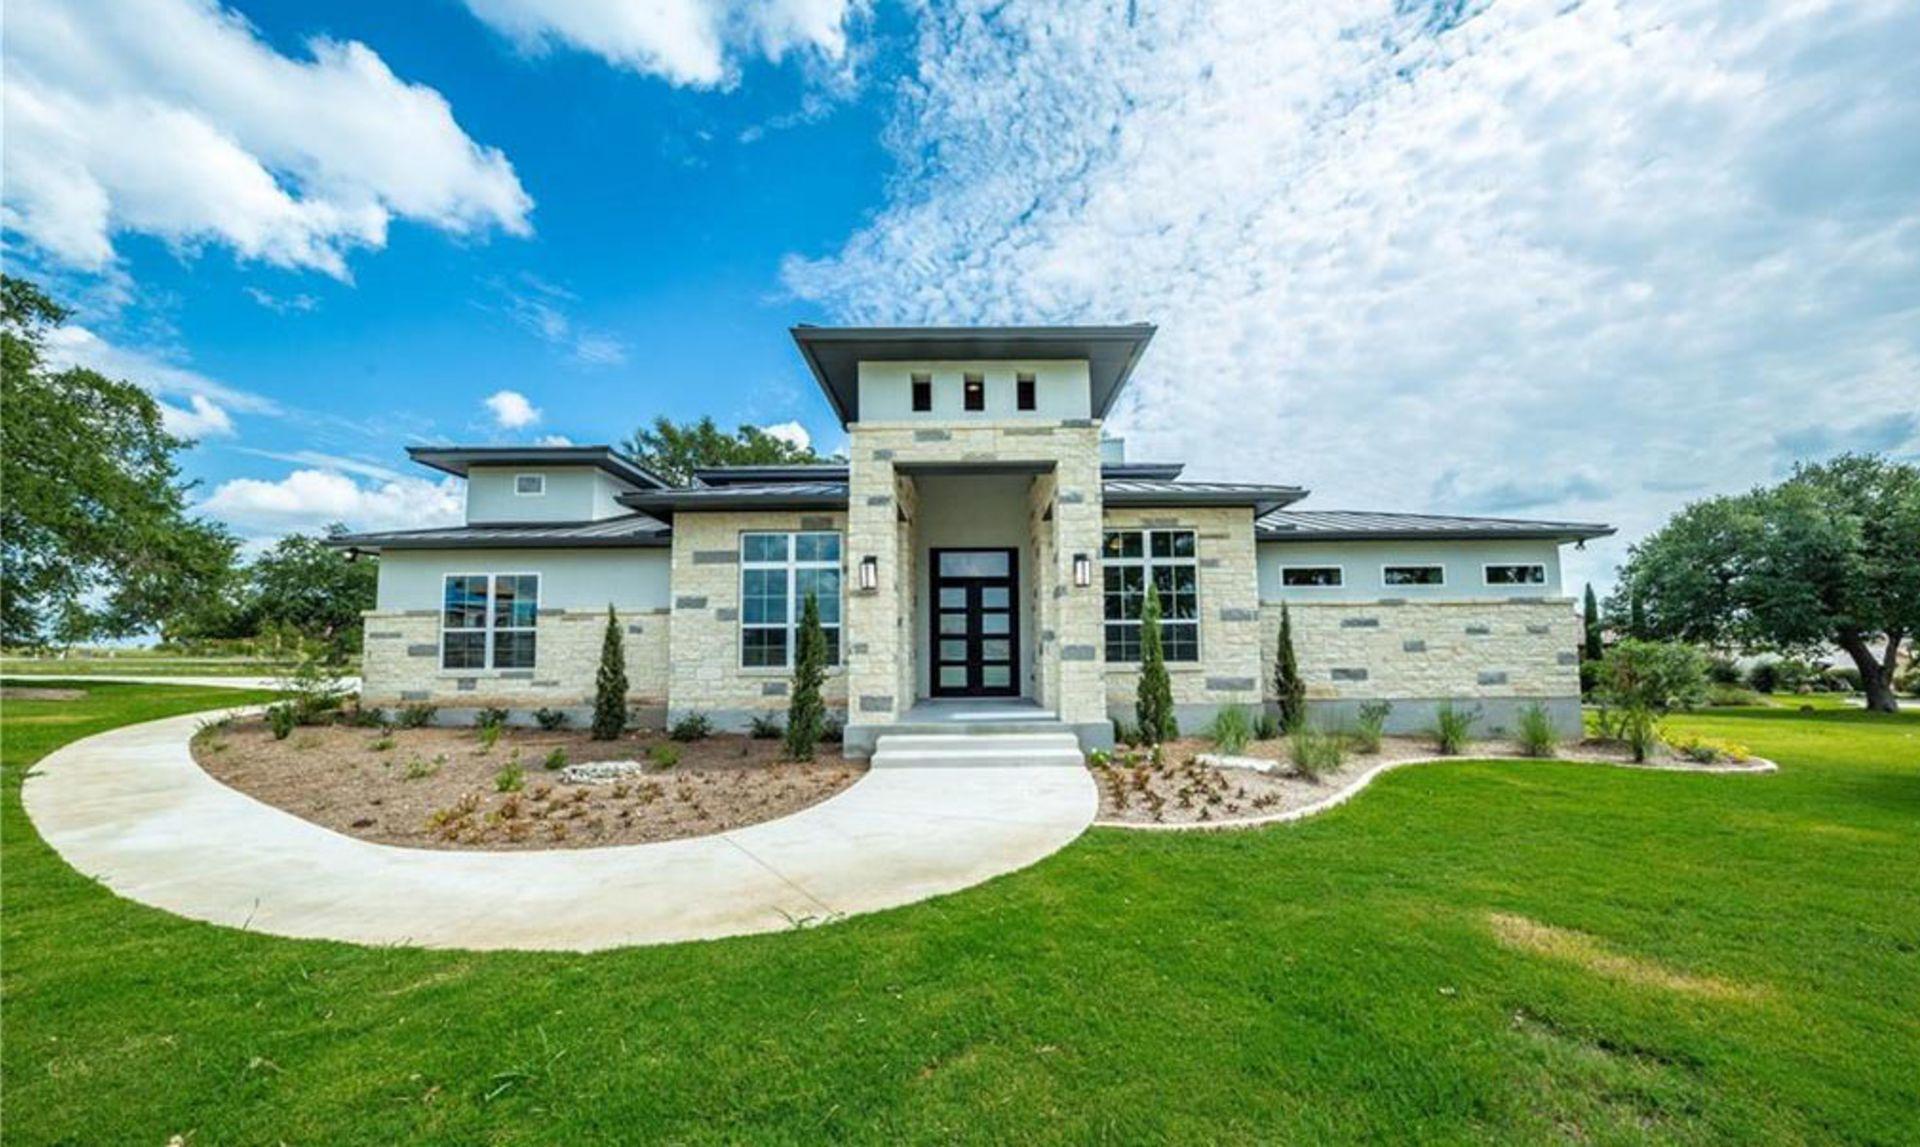 Building a Custom Home on a Budget